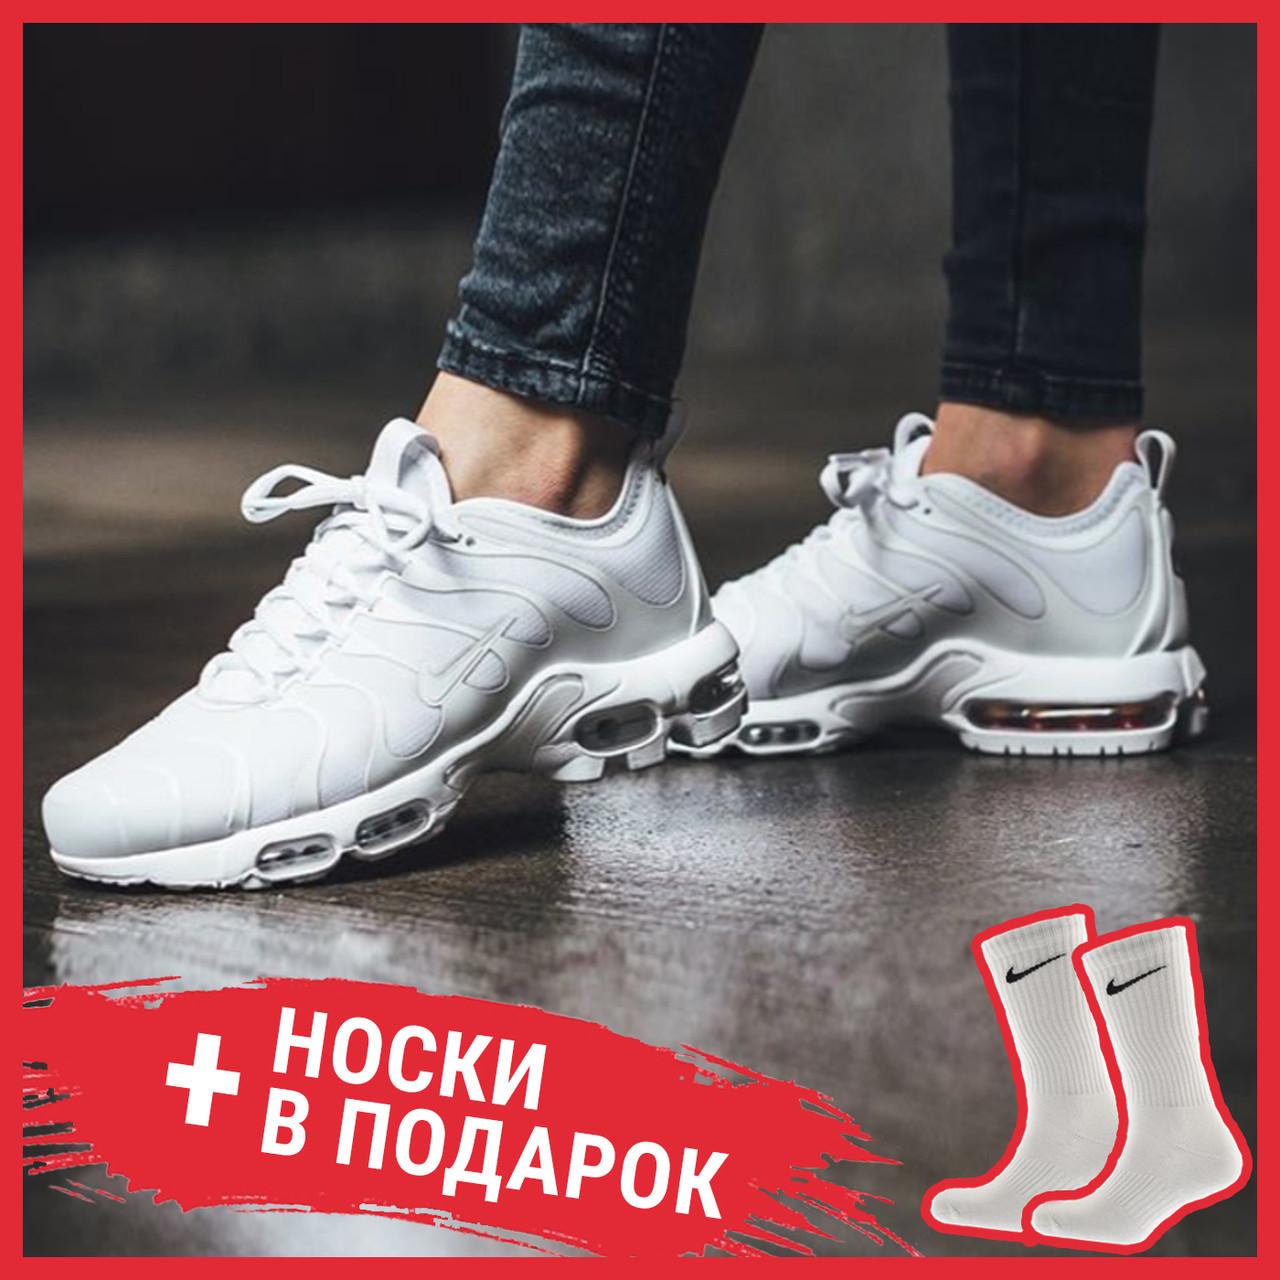 sale retailer 7b9b0 96605 Женские кроссовки Nike TN Air Max Plus Triple White AJ2029-100, Найк Аир  Макс ТН